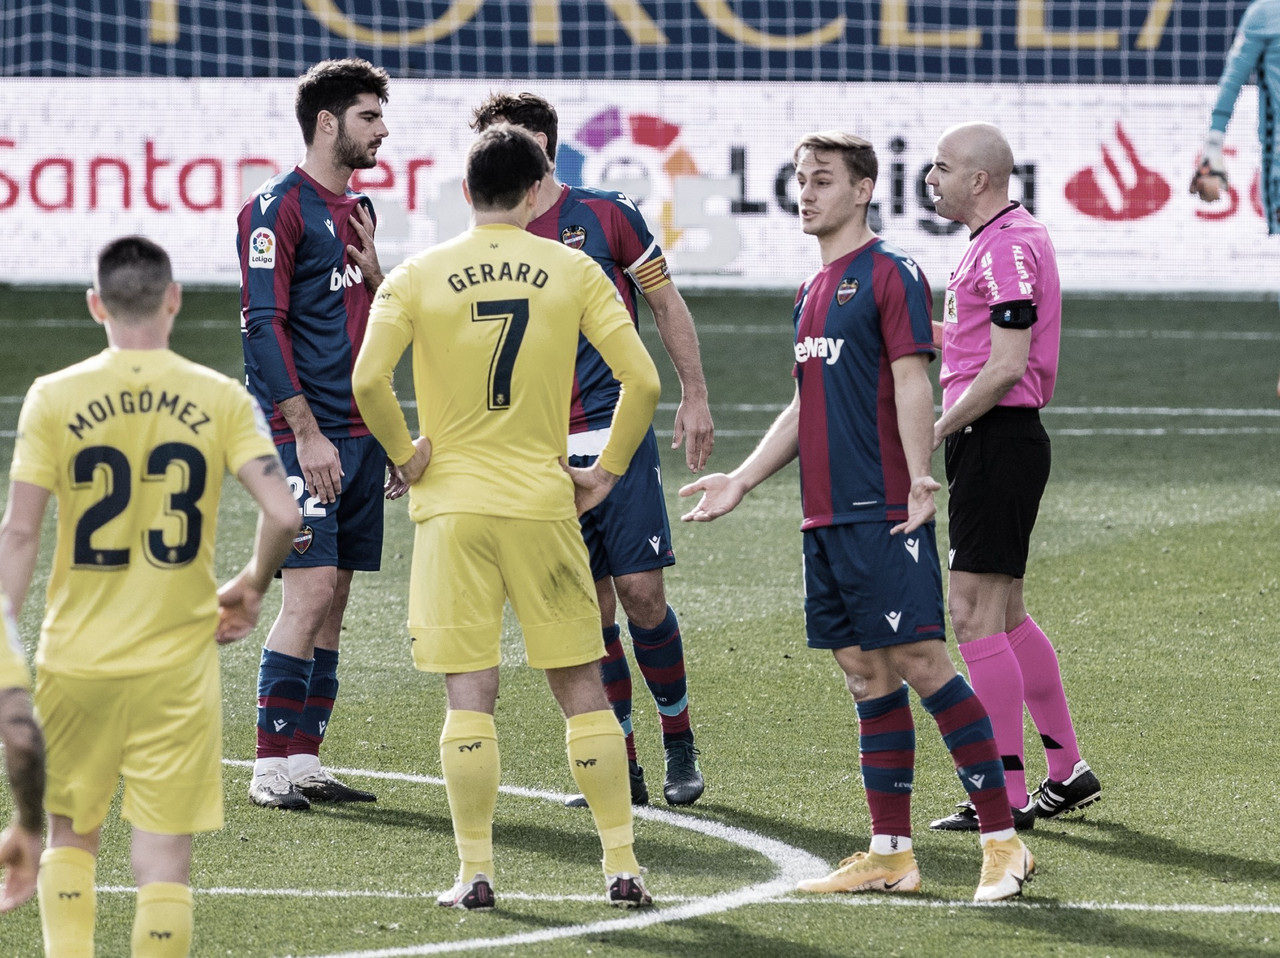 Previa Levante – Villarreal: a empezar febrero con buen pie